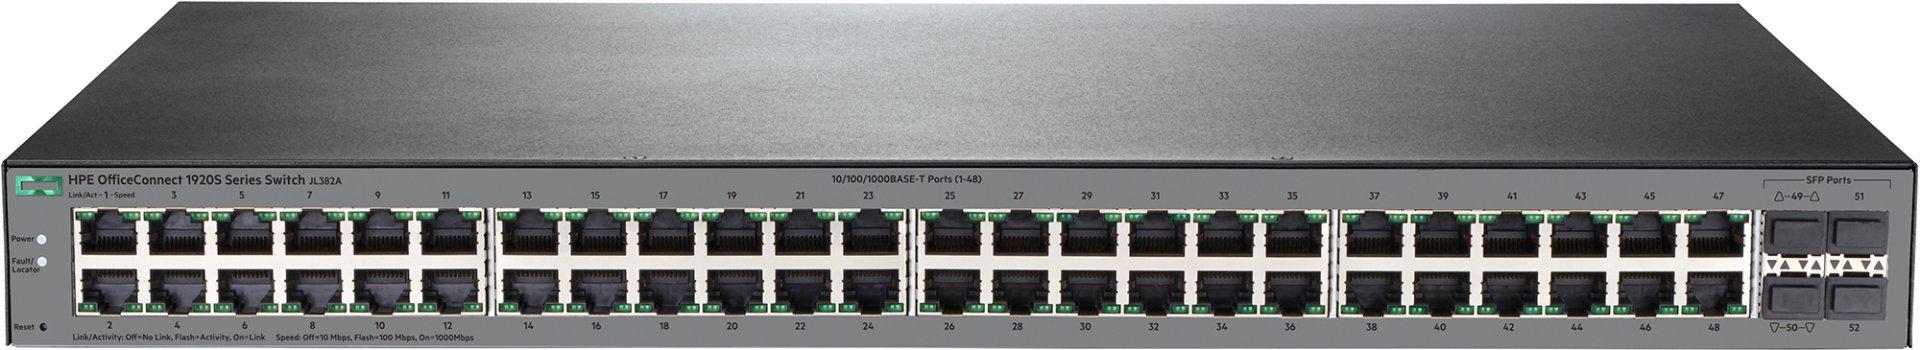 Коммутатор HP OfficeConnect 1920S 48G 4SFP